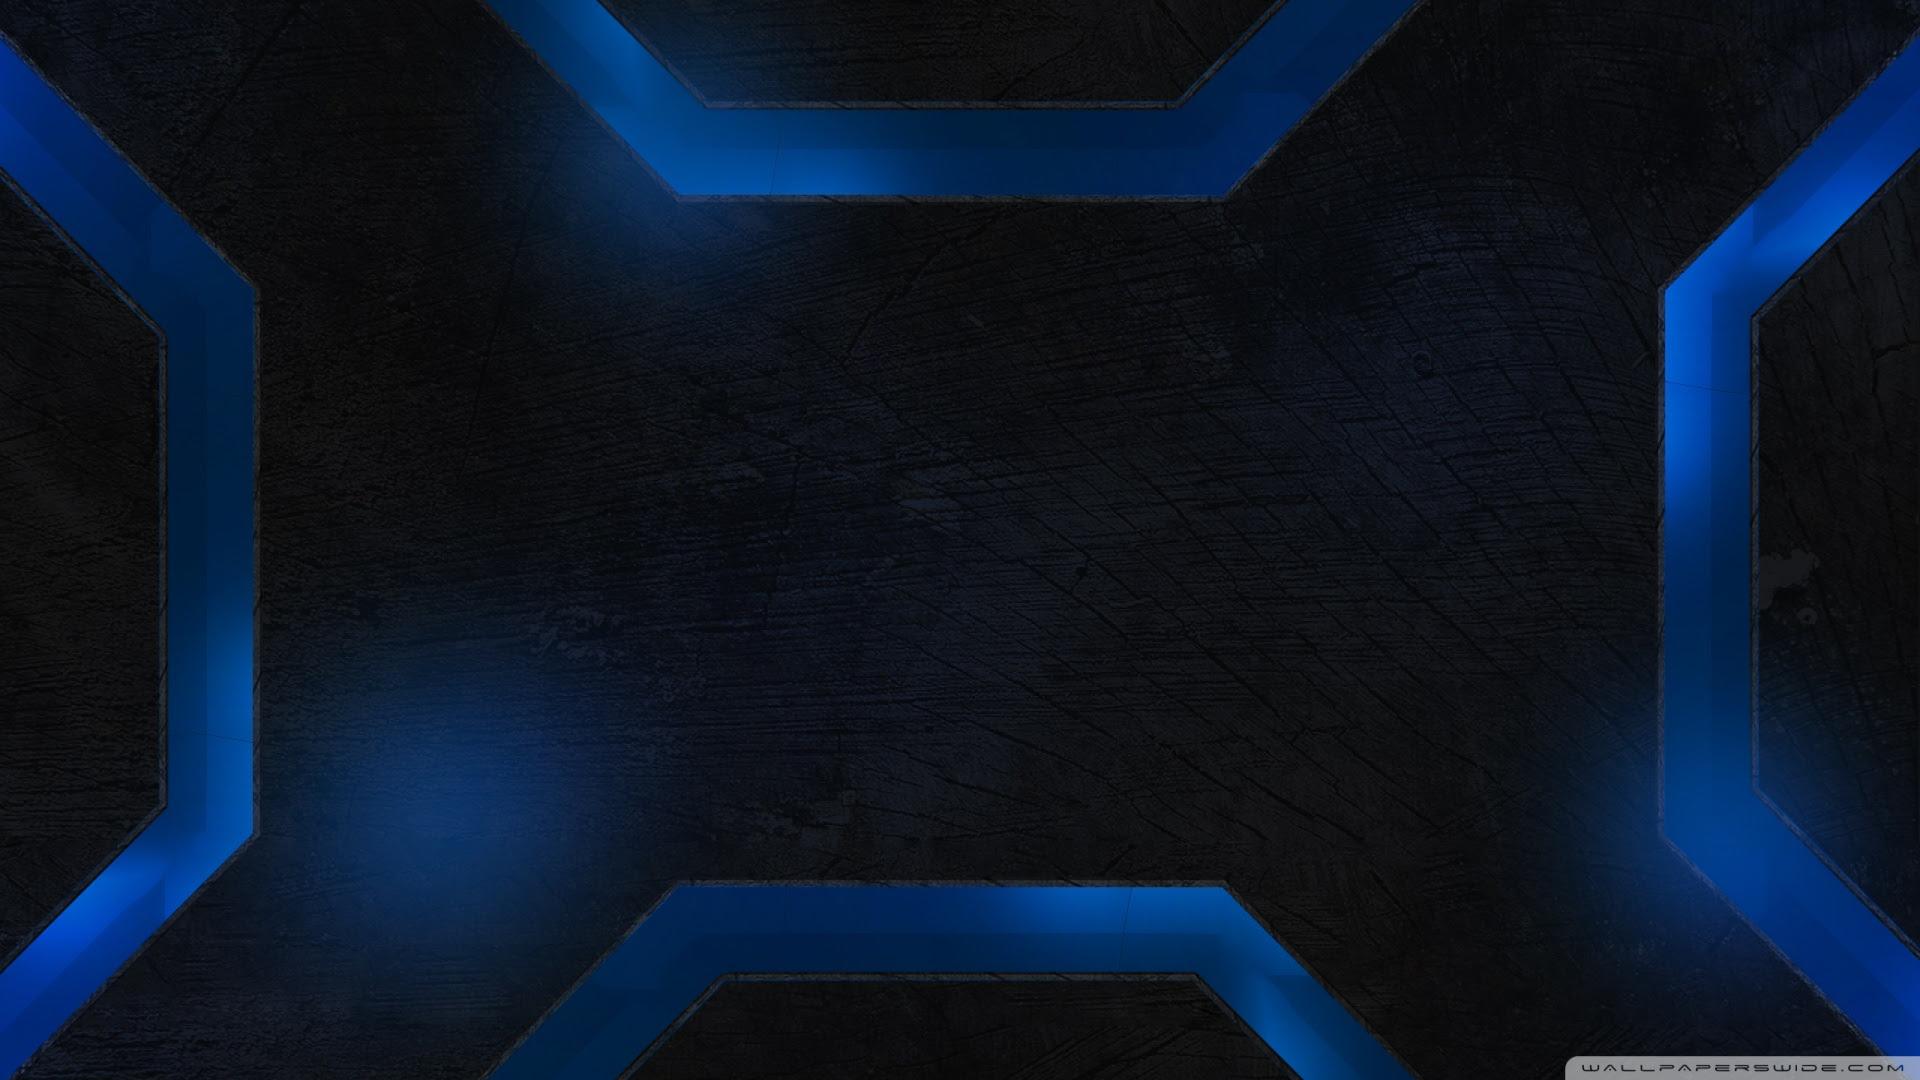 Blue Neon Ultra Hd Desktop Background Wallpaper For 4k Uhd Tv